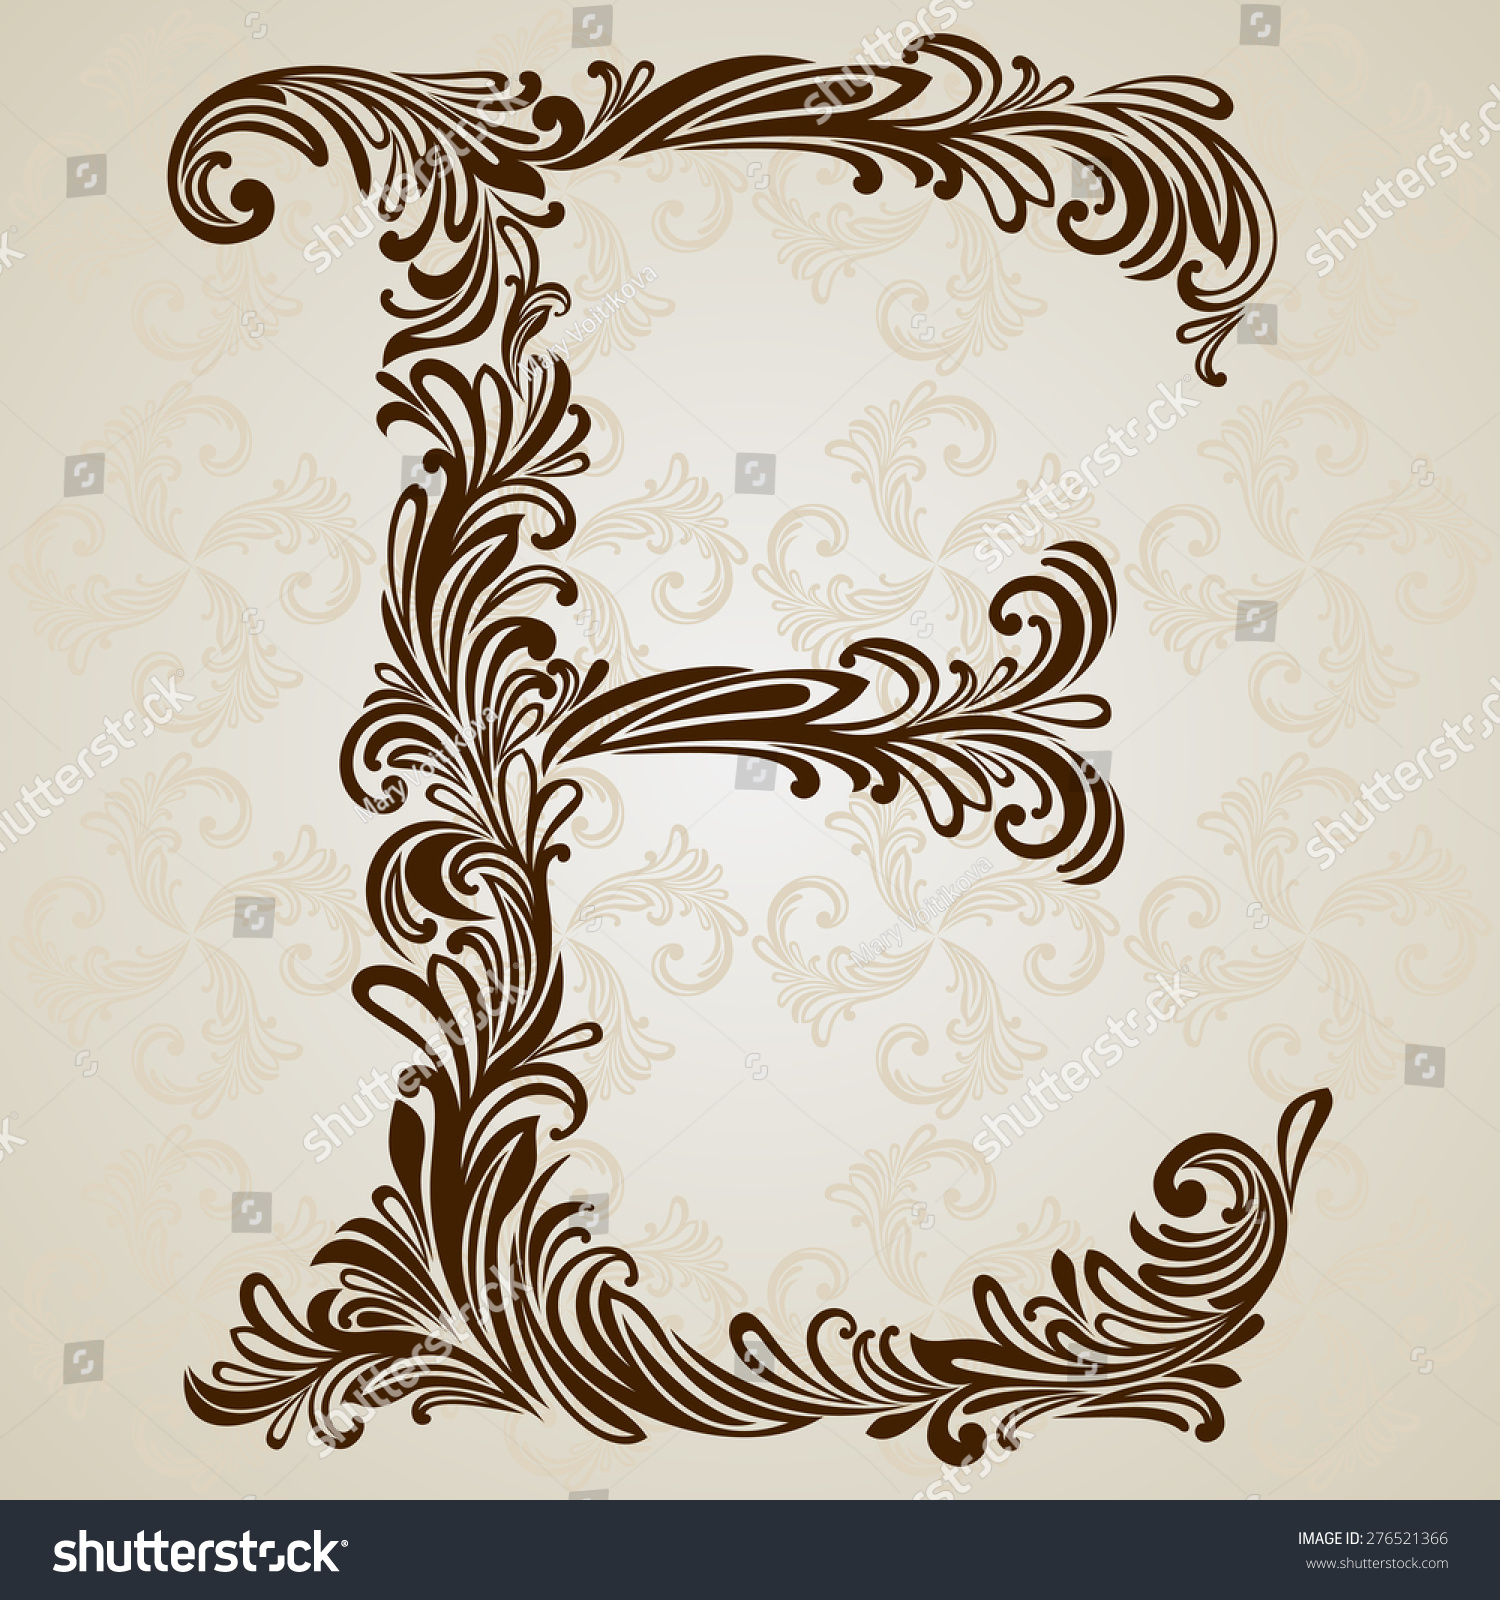 Calligraphic Font Vintage Initials Letter E Vector Design Background Swirl Style Illustration